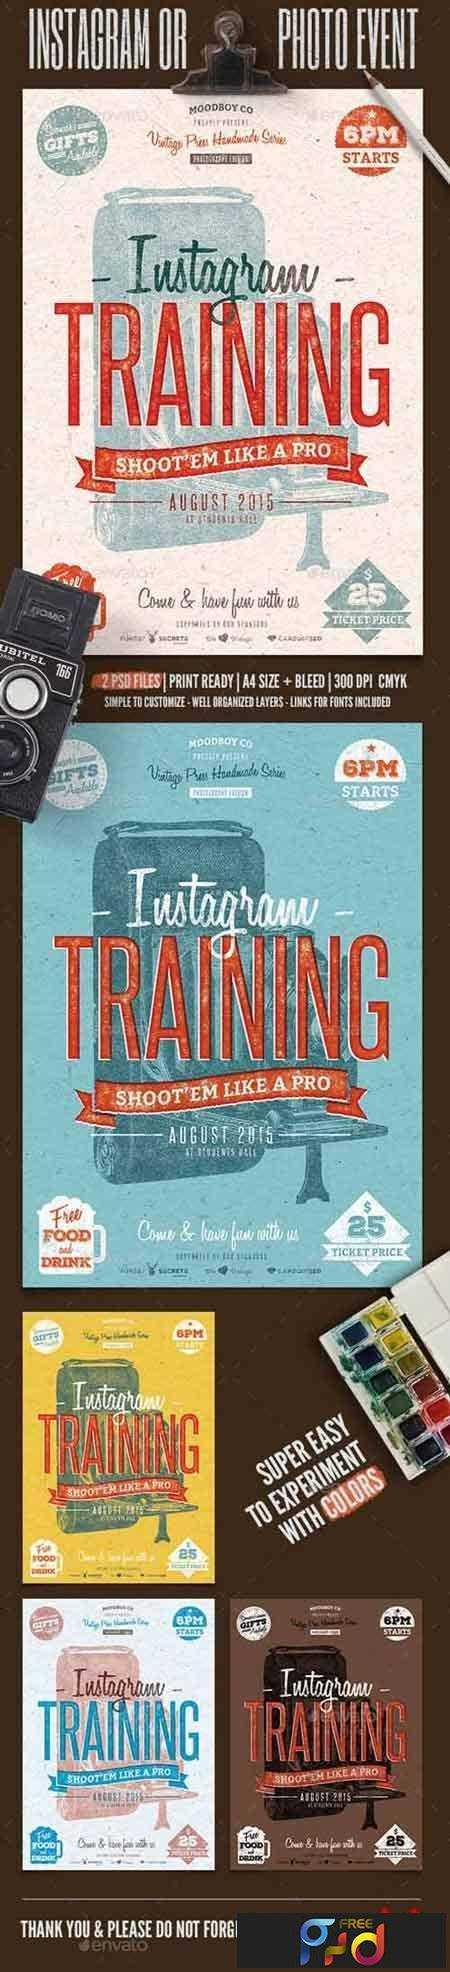 freepsdvn-com_1479178116_instagram-photography-event-flyer-poster-11893852